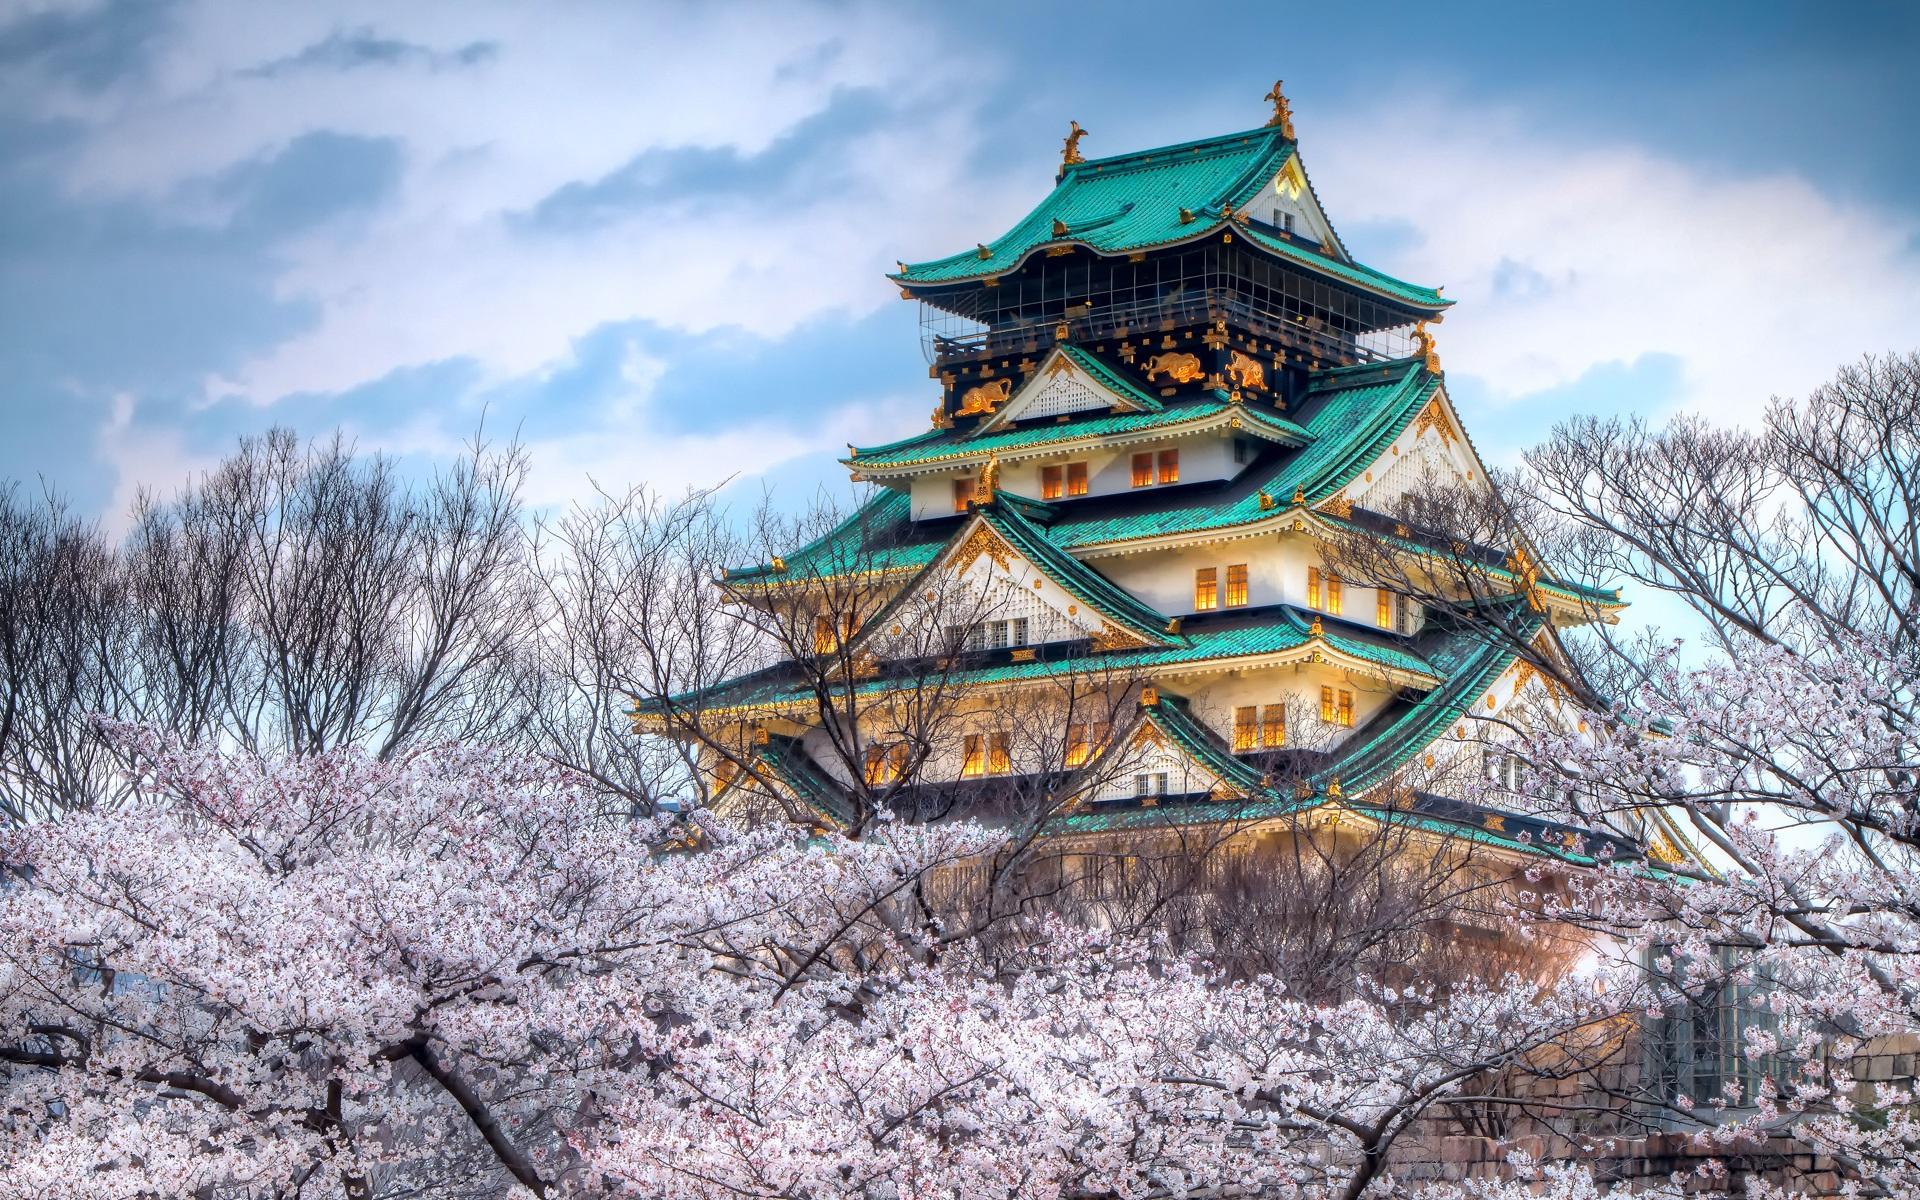 Wallpaper japanische kirschblüten  Der Tempel der Kirschblüte in Japan Hintergrundbilder | 1920x1200 ...